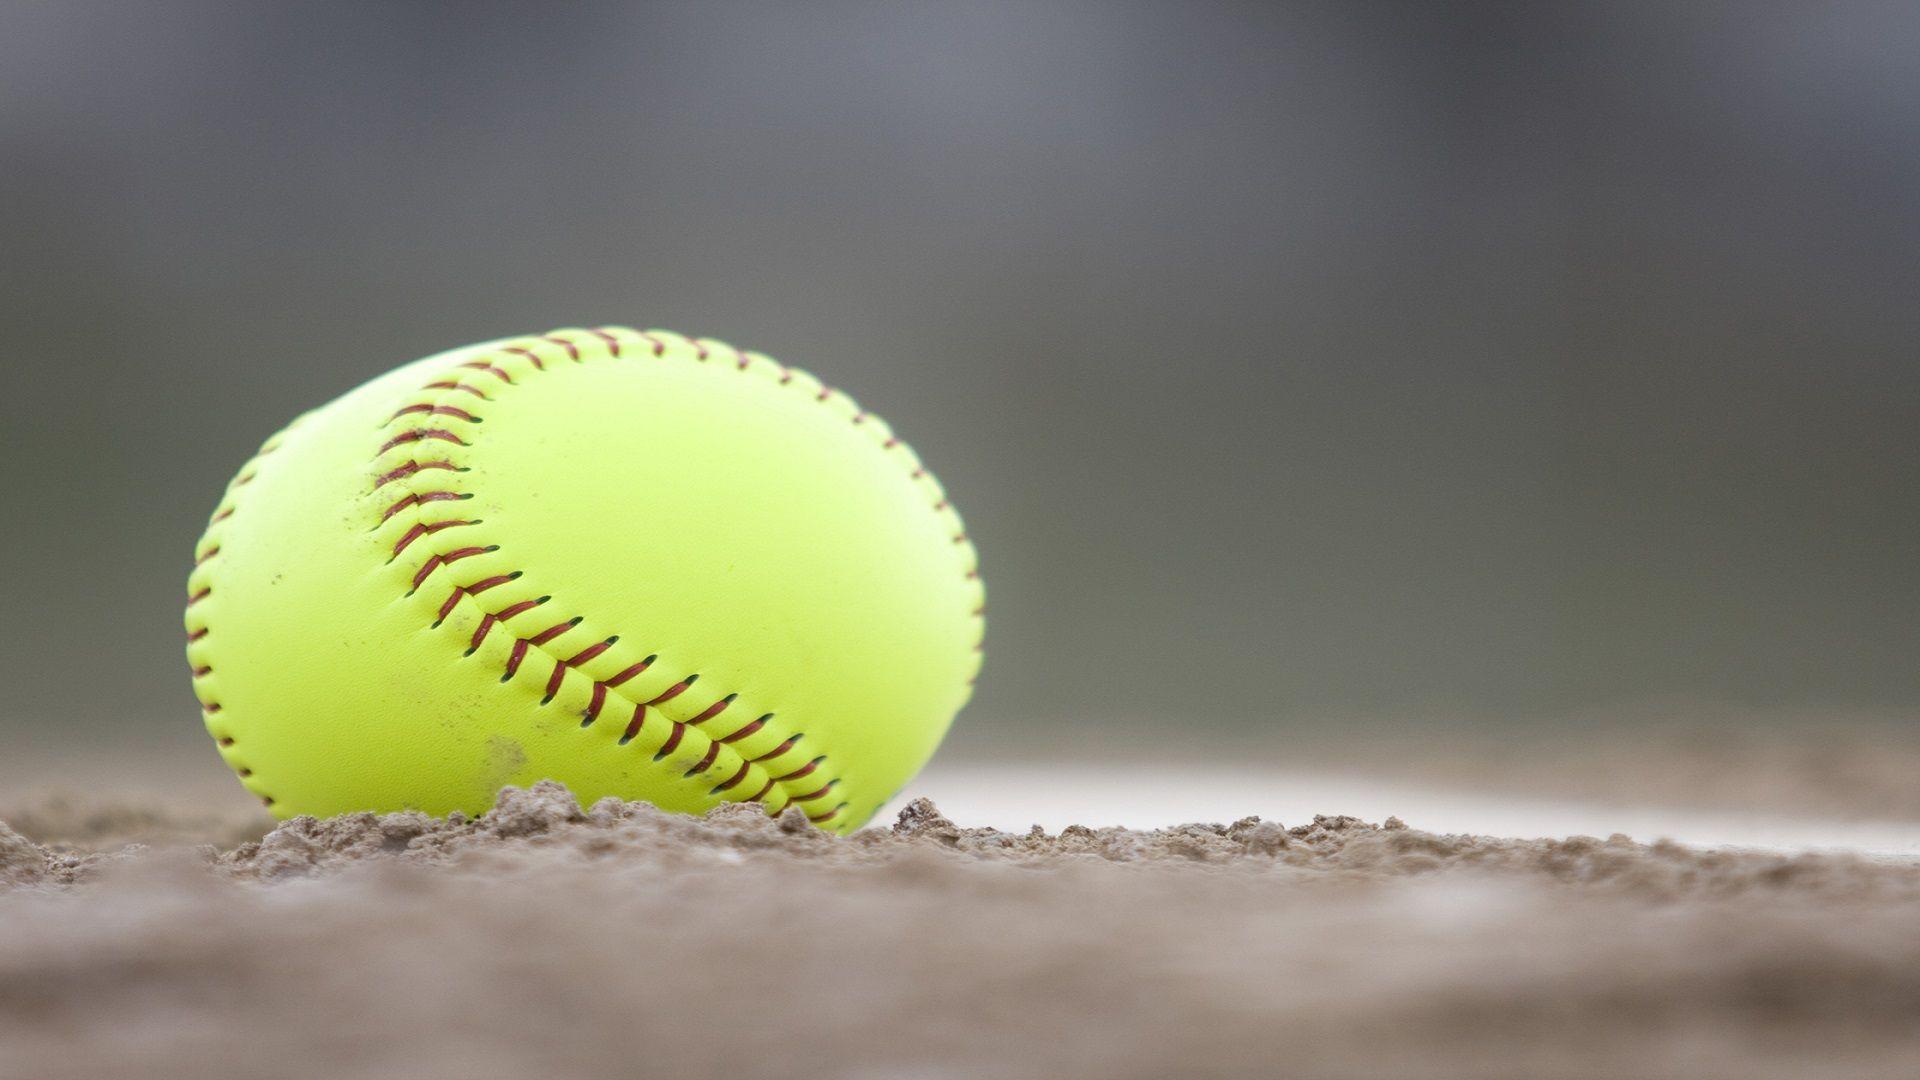 Softball Backgrounds For Computer: Softball HD Desktop Wallpapers